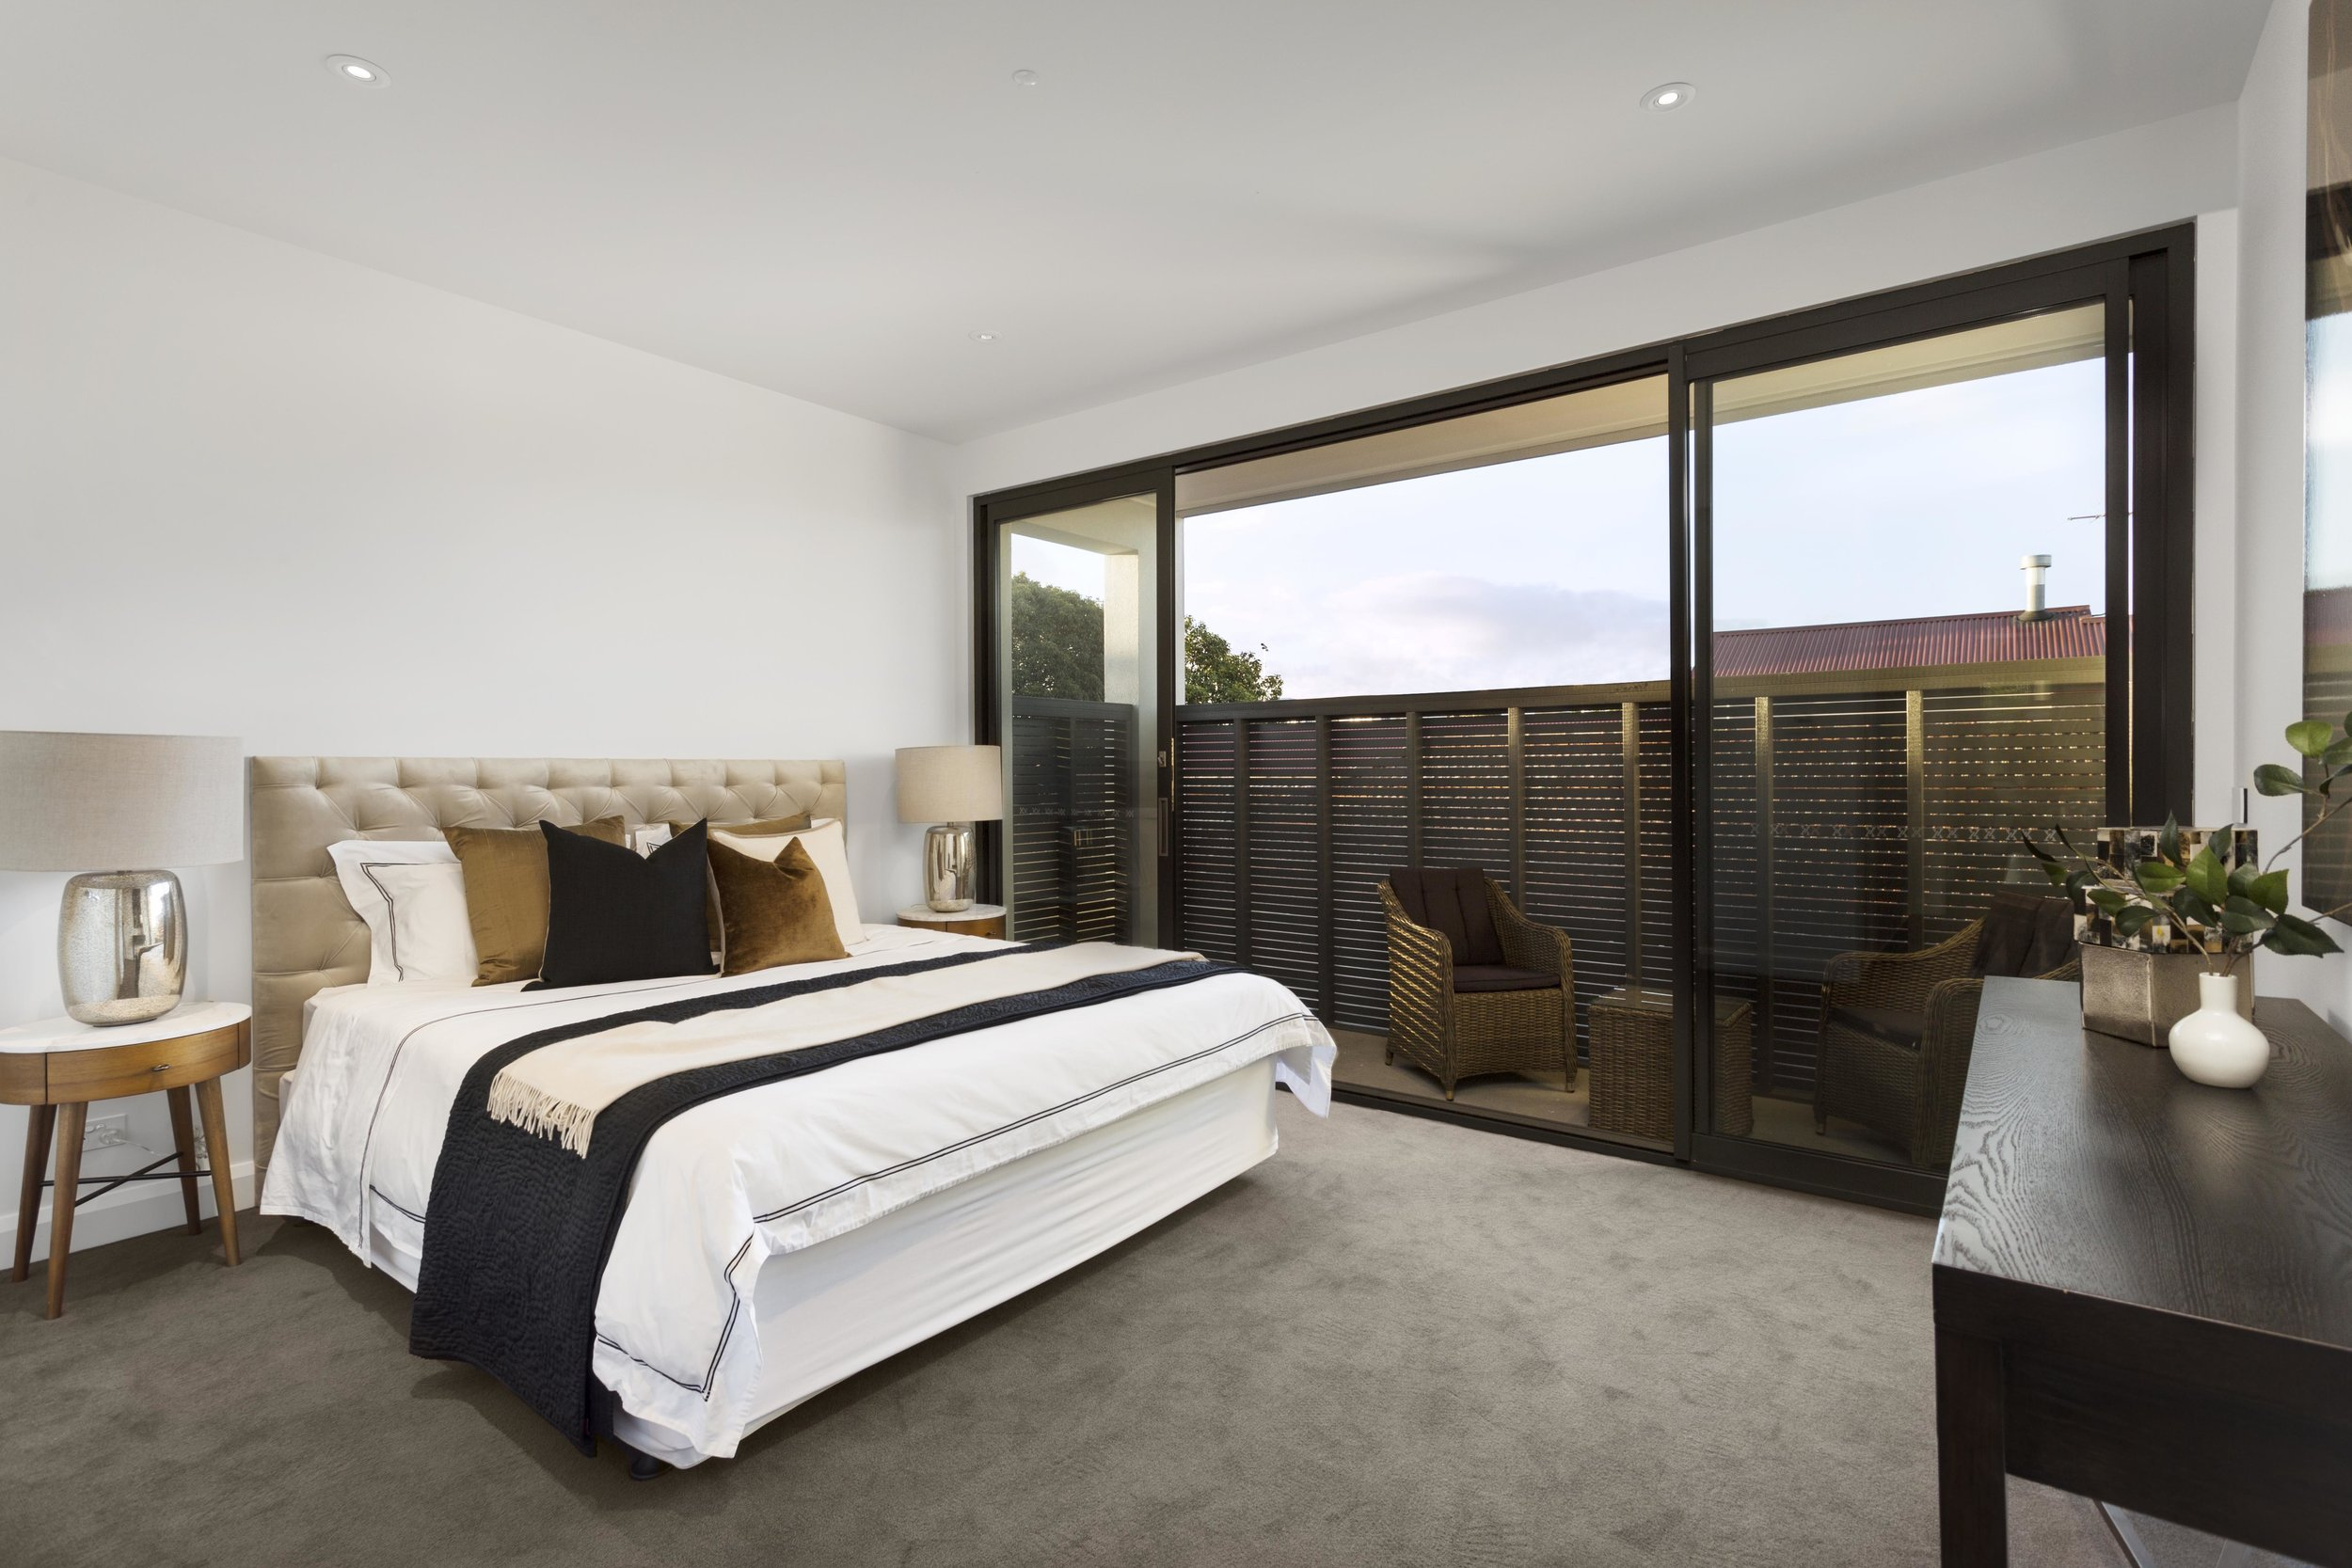 Armadale-Residence-Guymer-Bailey-Architects-06.jpg